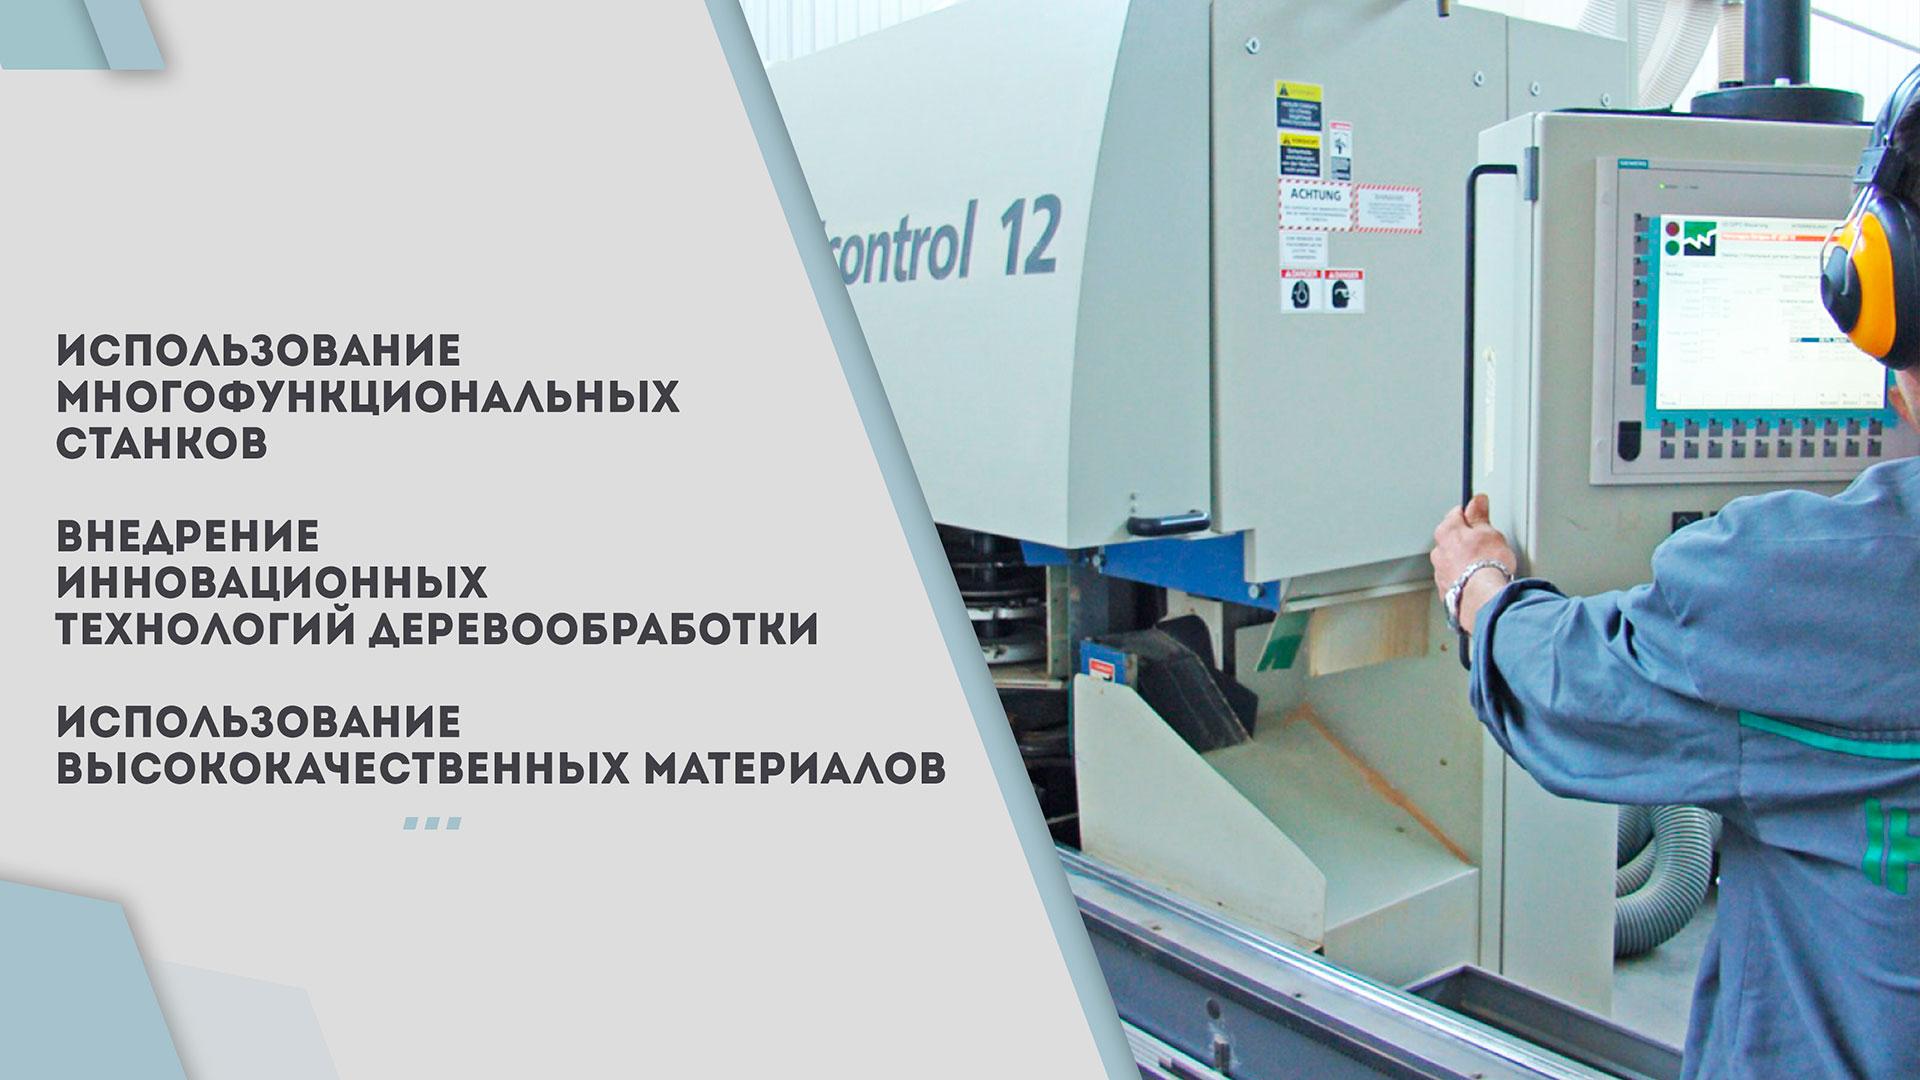 proizvodstvo-mebelm-banner-4